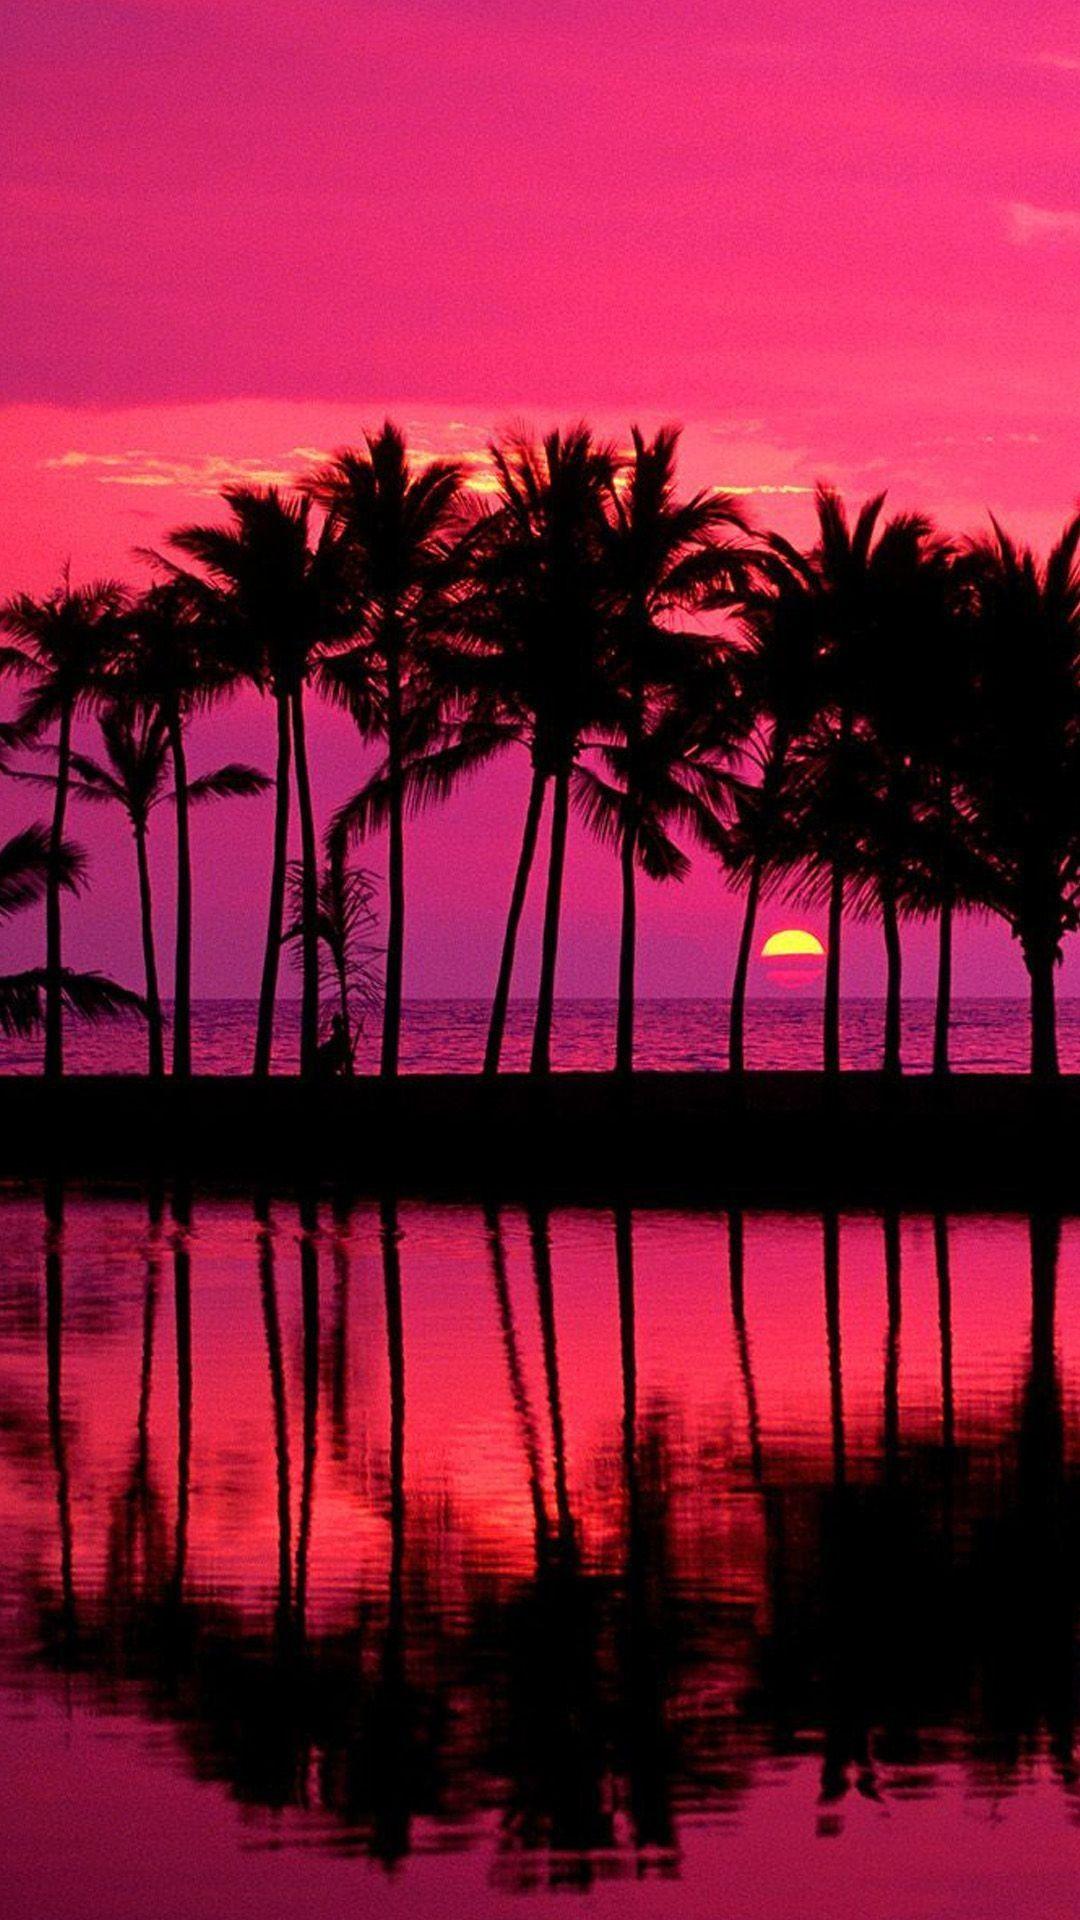 Pink Sunset Wallpaper Home Screen Iphone Wallpaper Tropical Sunset Wallpaper Pink Wallpaper Iphone